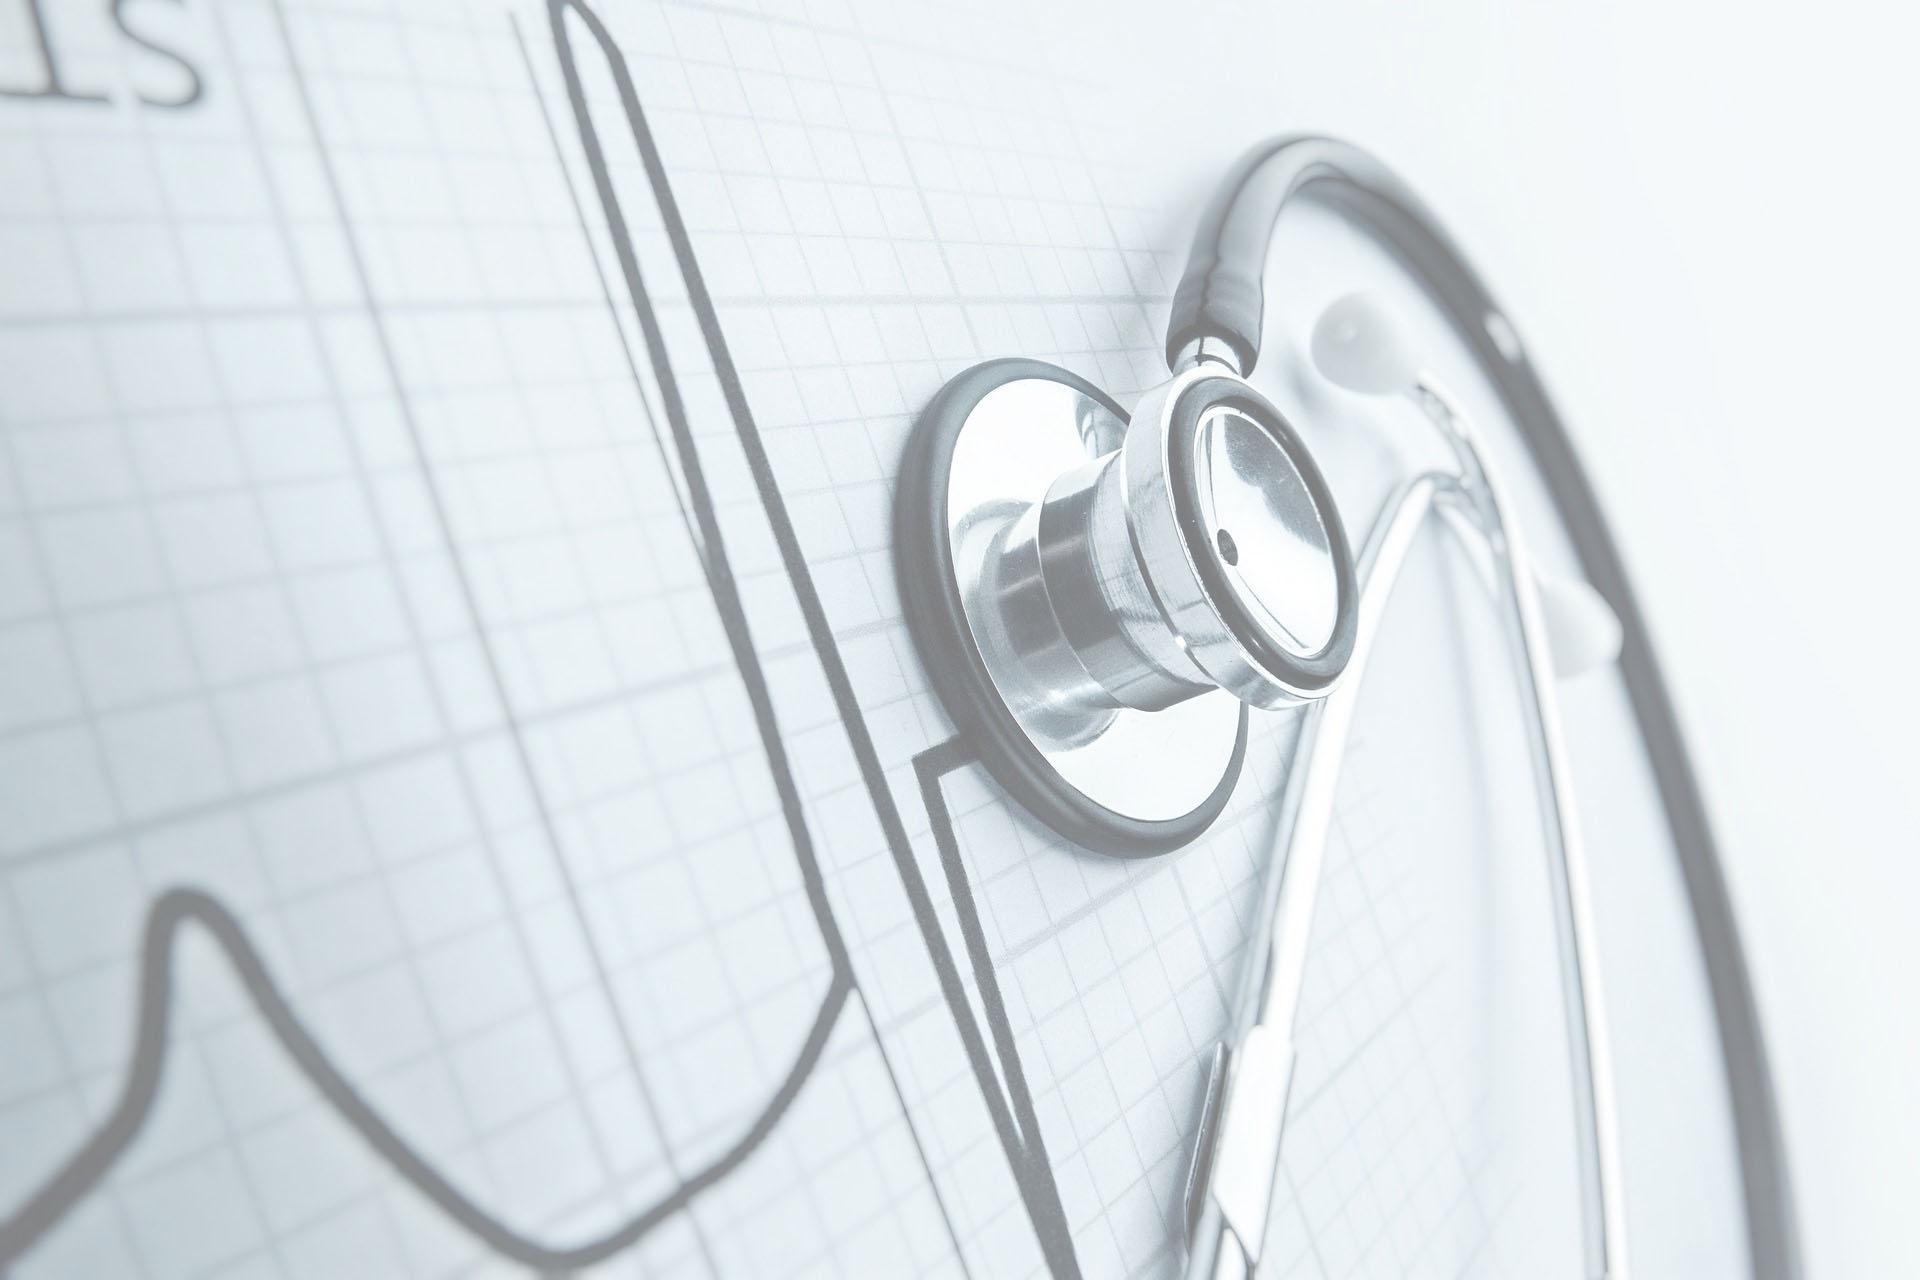 stethoskop hintergrundbild